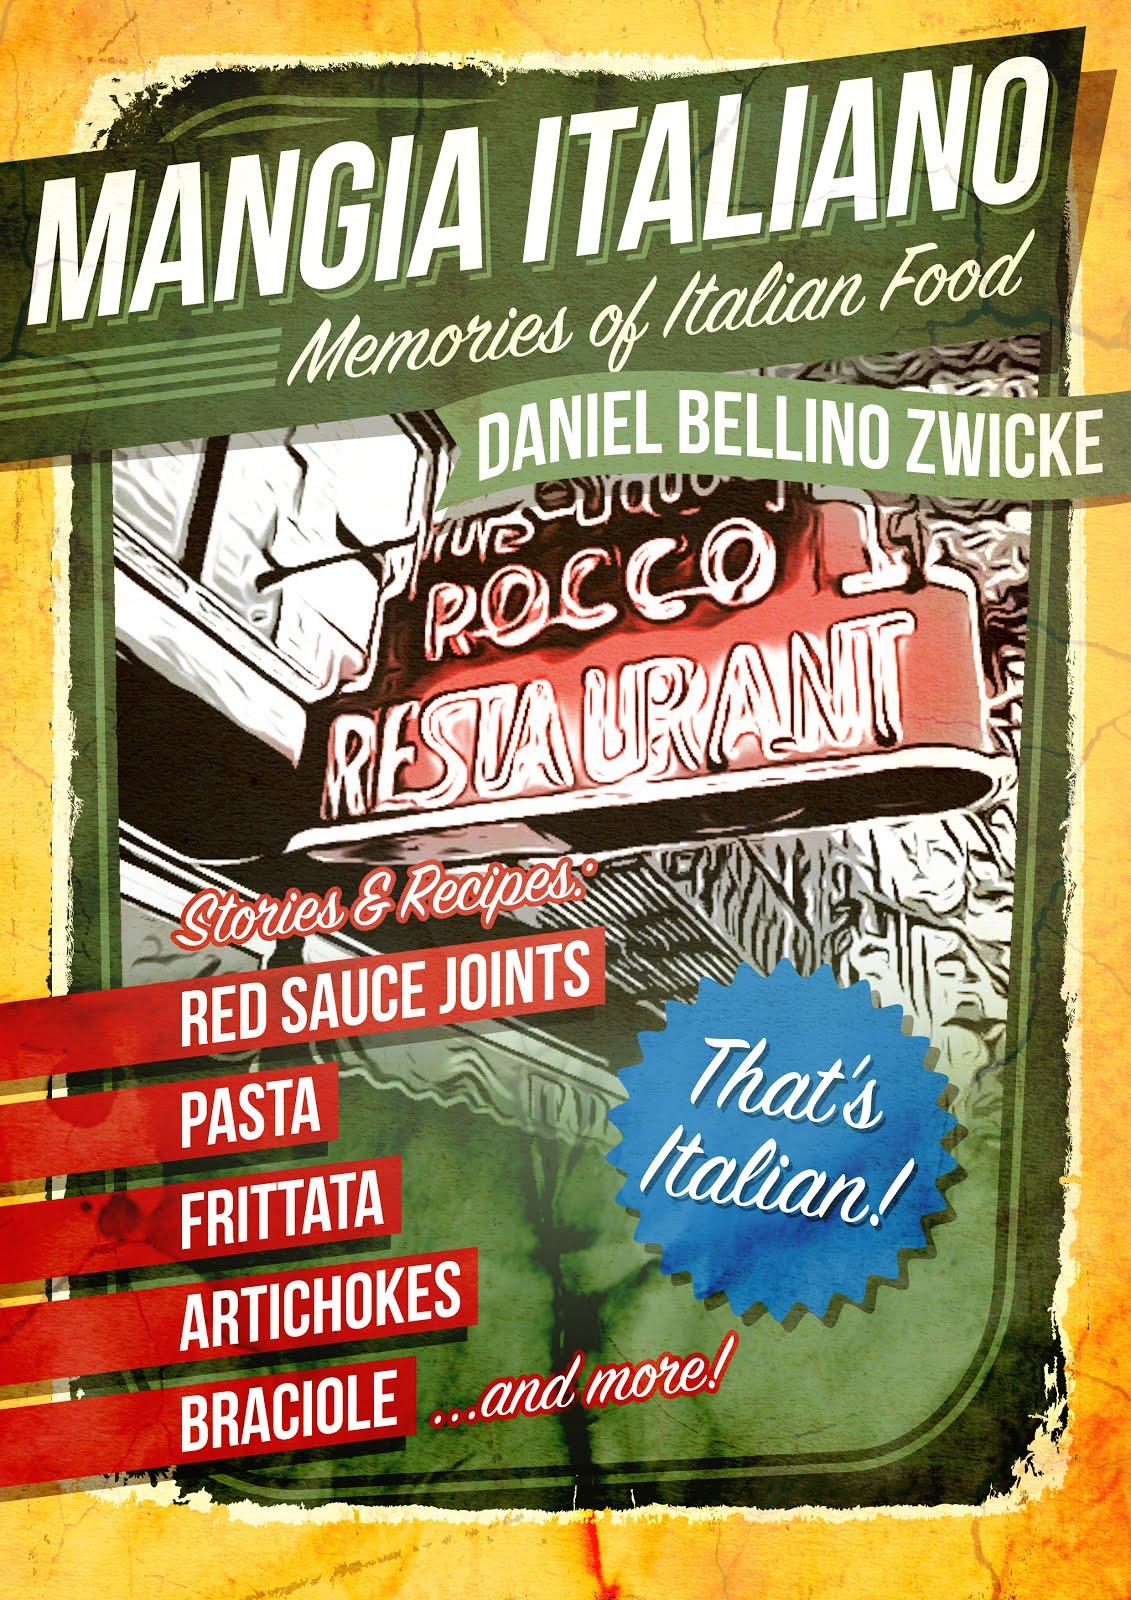 MANGIA ITALIANO !